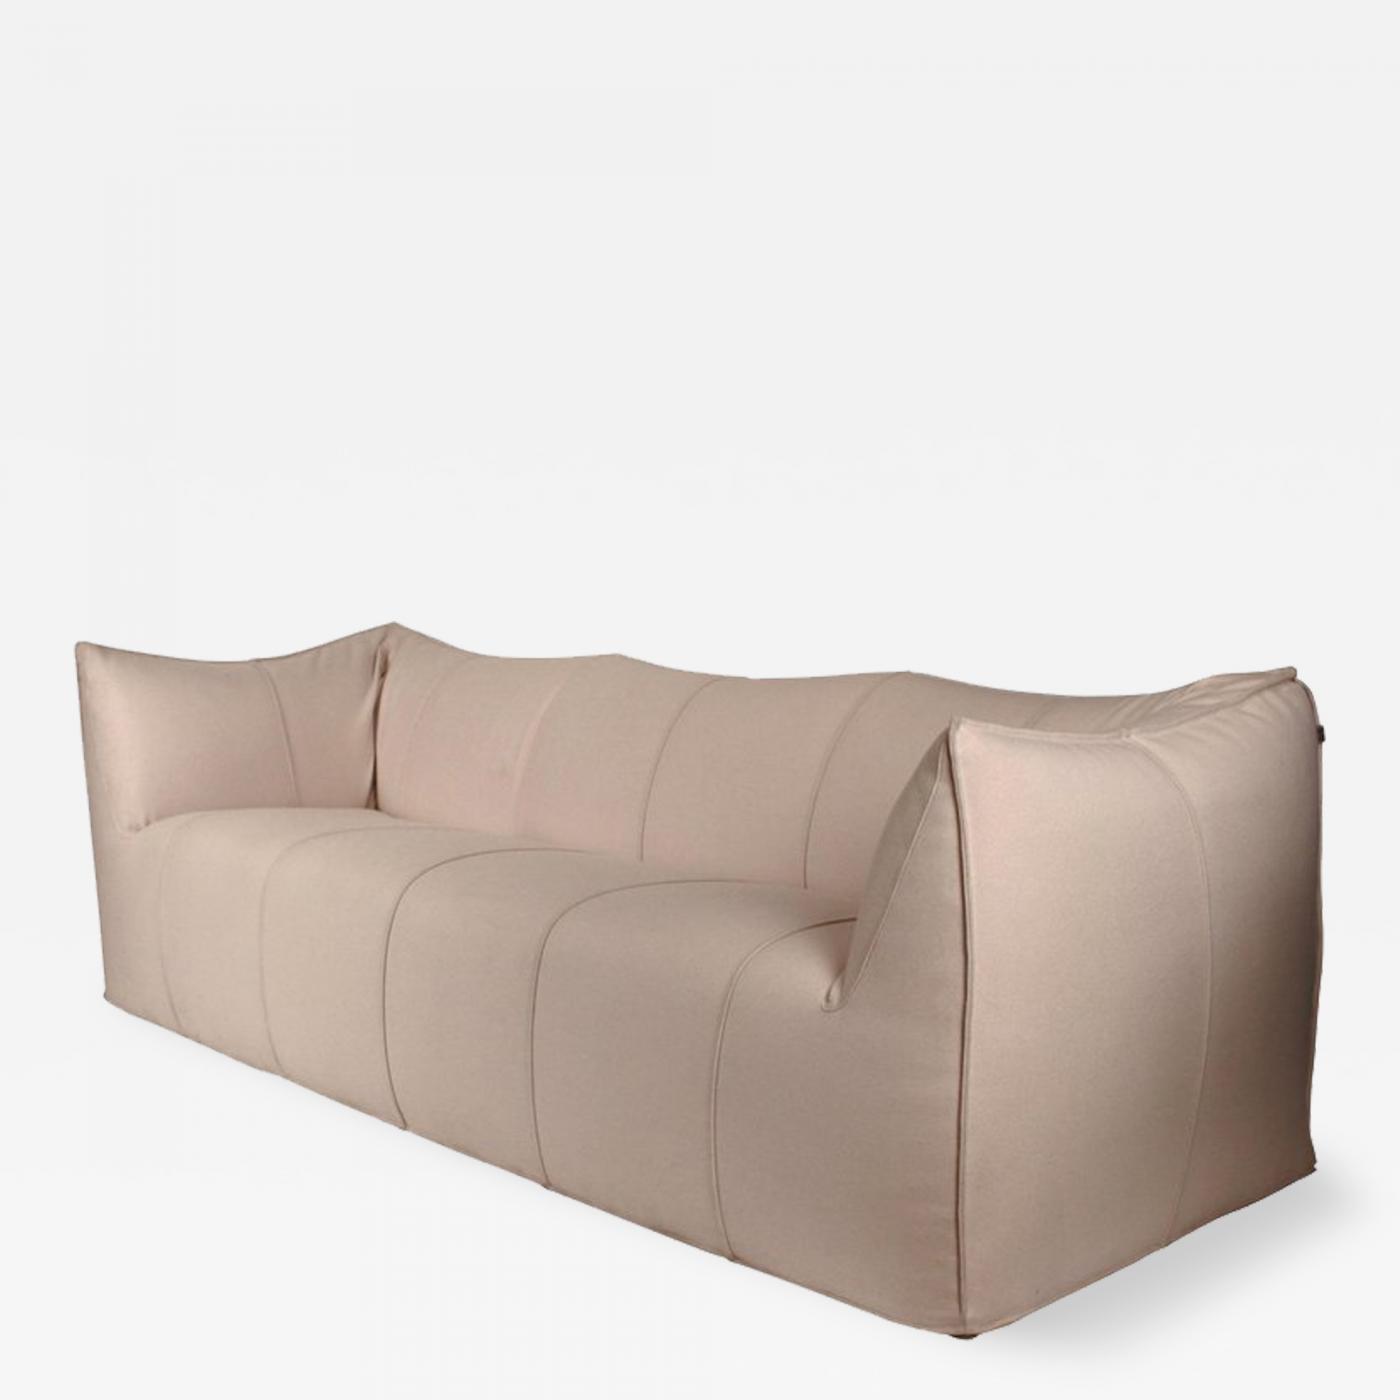 B B Italia Mario Bellini Le Bambole Sofa Ottoman For B B Italia In